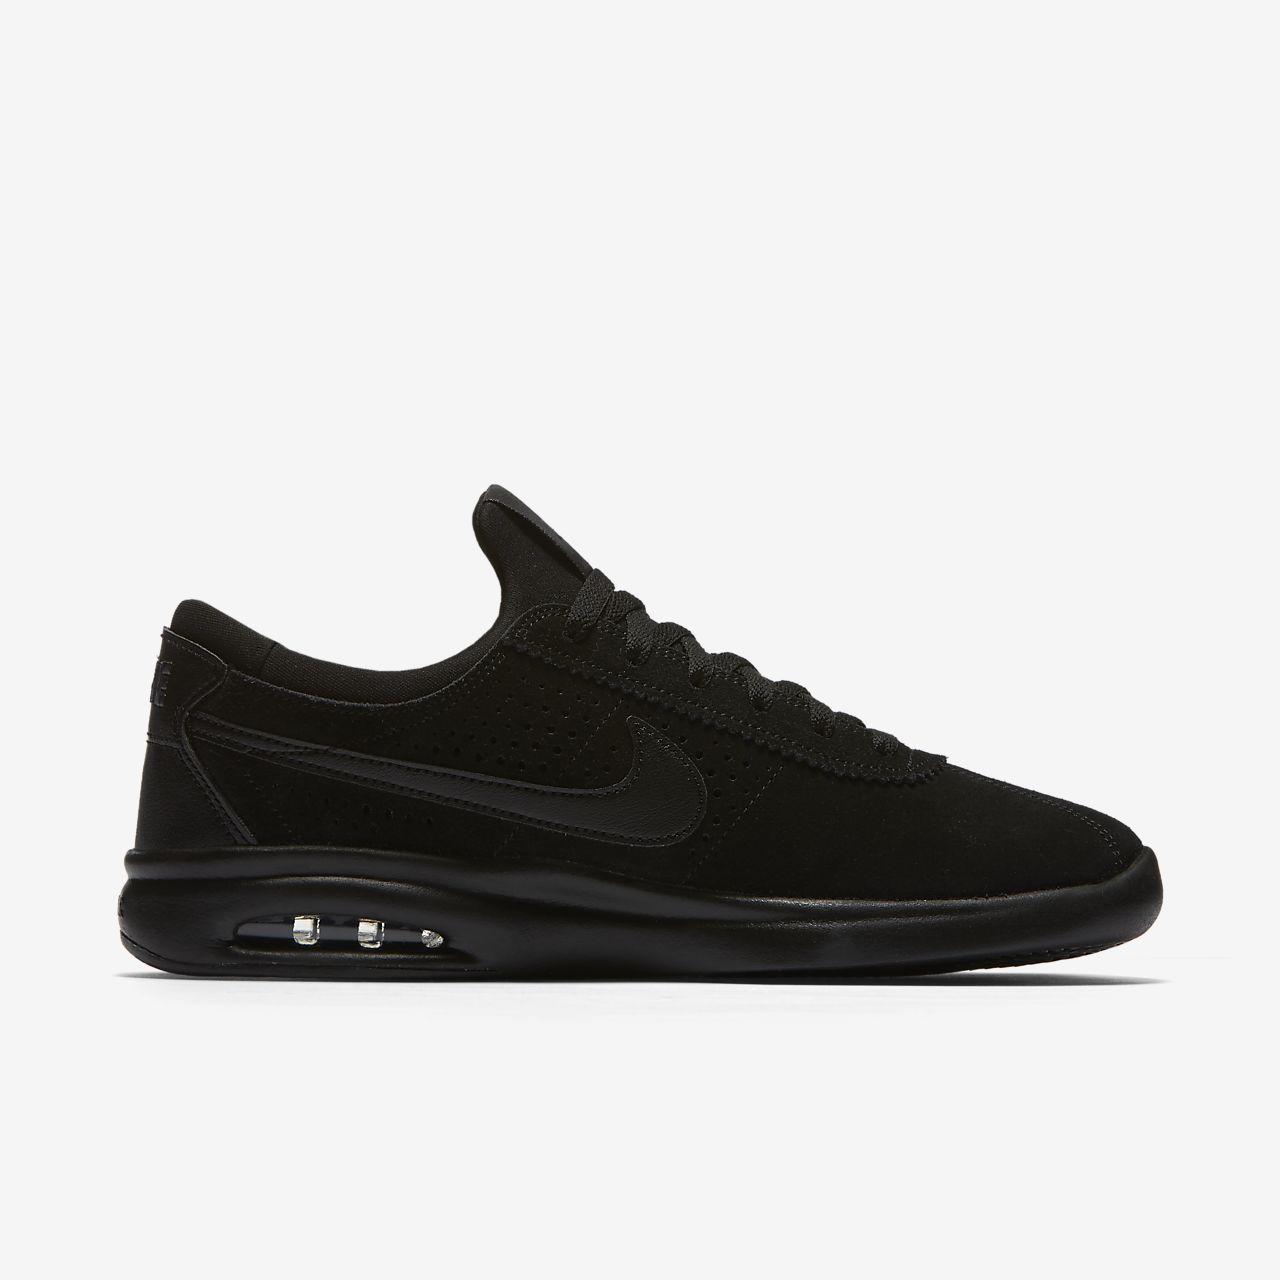 Chaussures Nike Blazer Marron Taille 45 Hommes X5ooe8